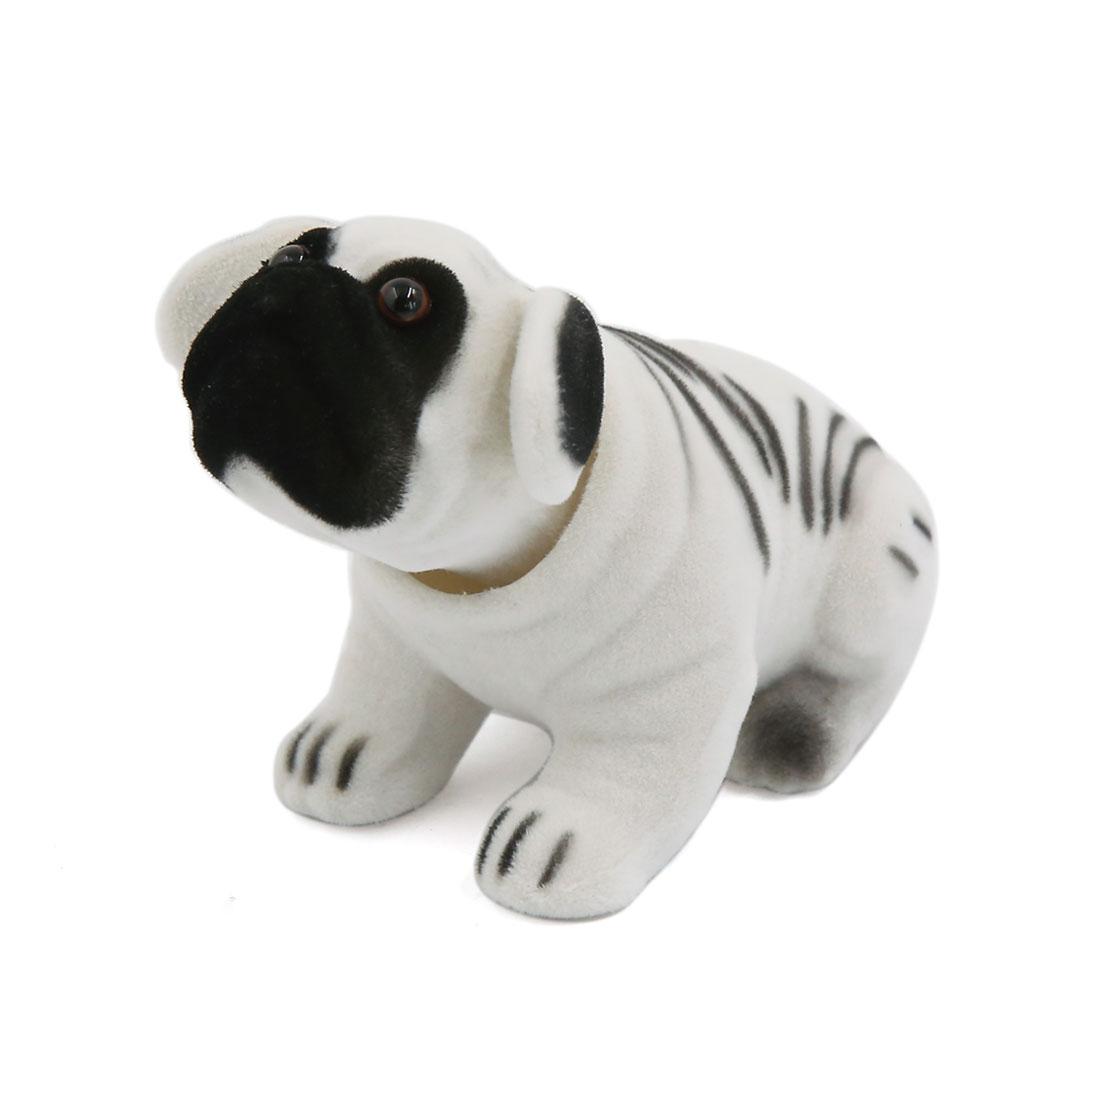 Car Cute Doll Decoration Shaking Head Nodding Dog Auto Ornament White Black